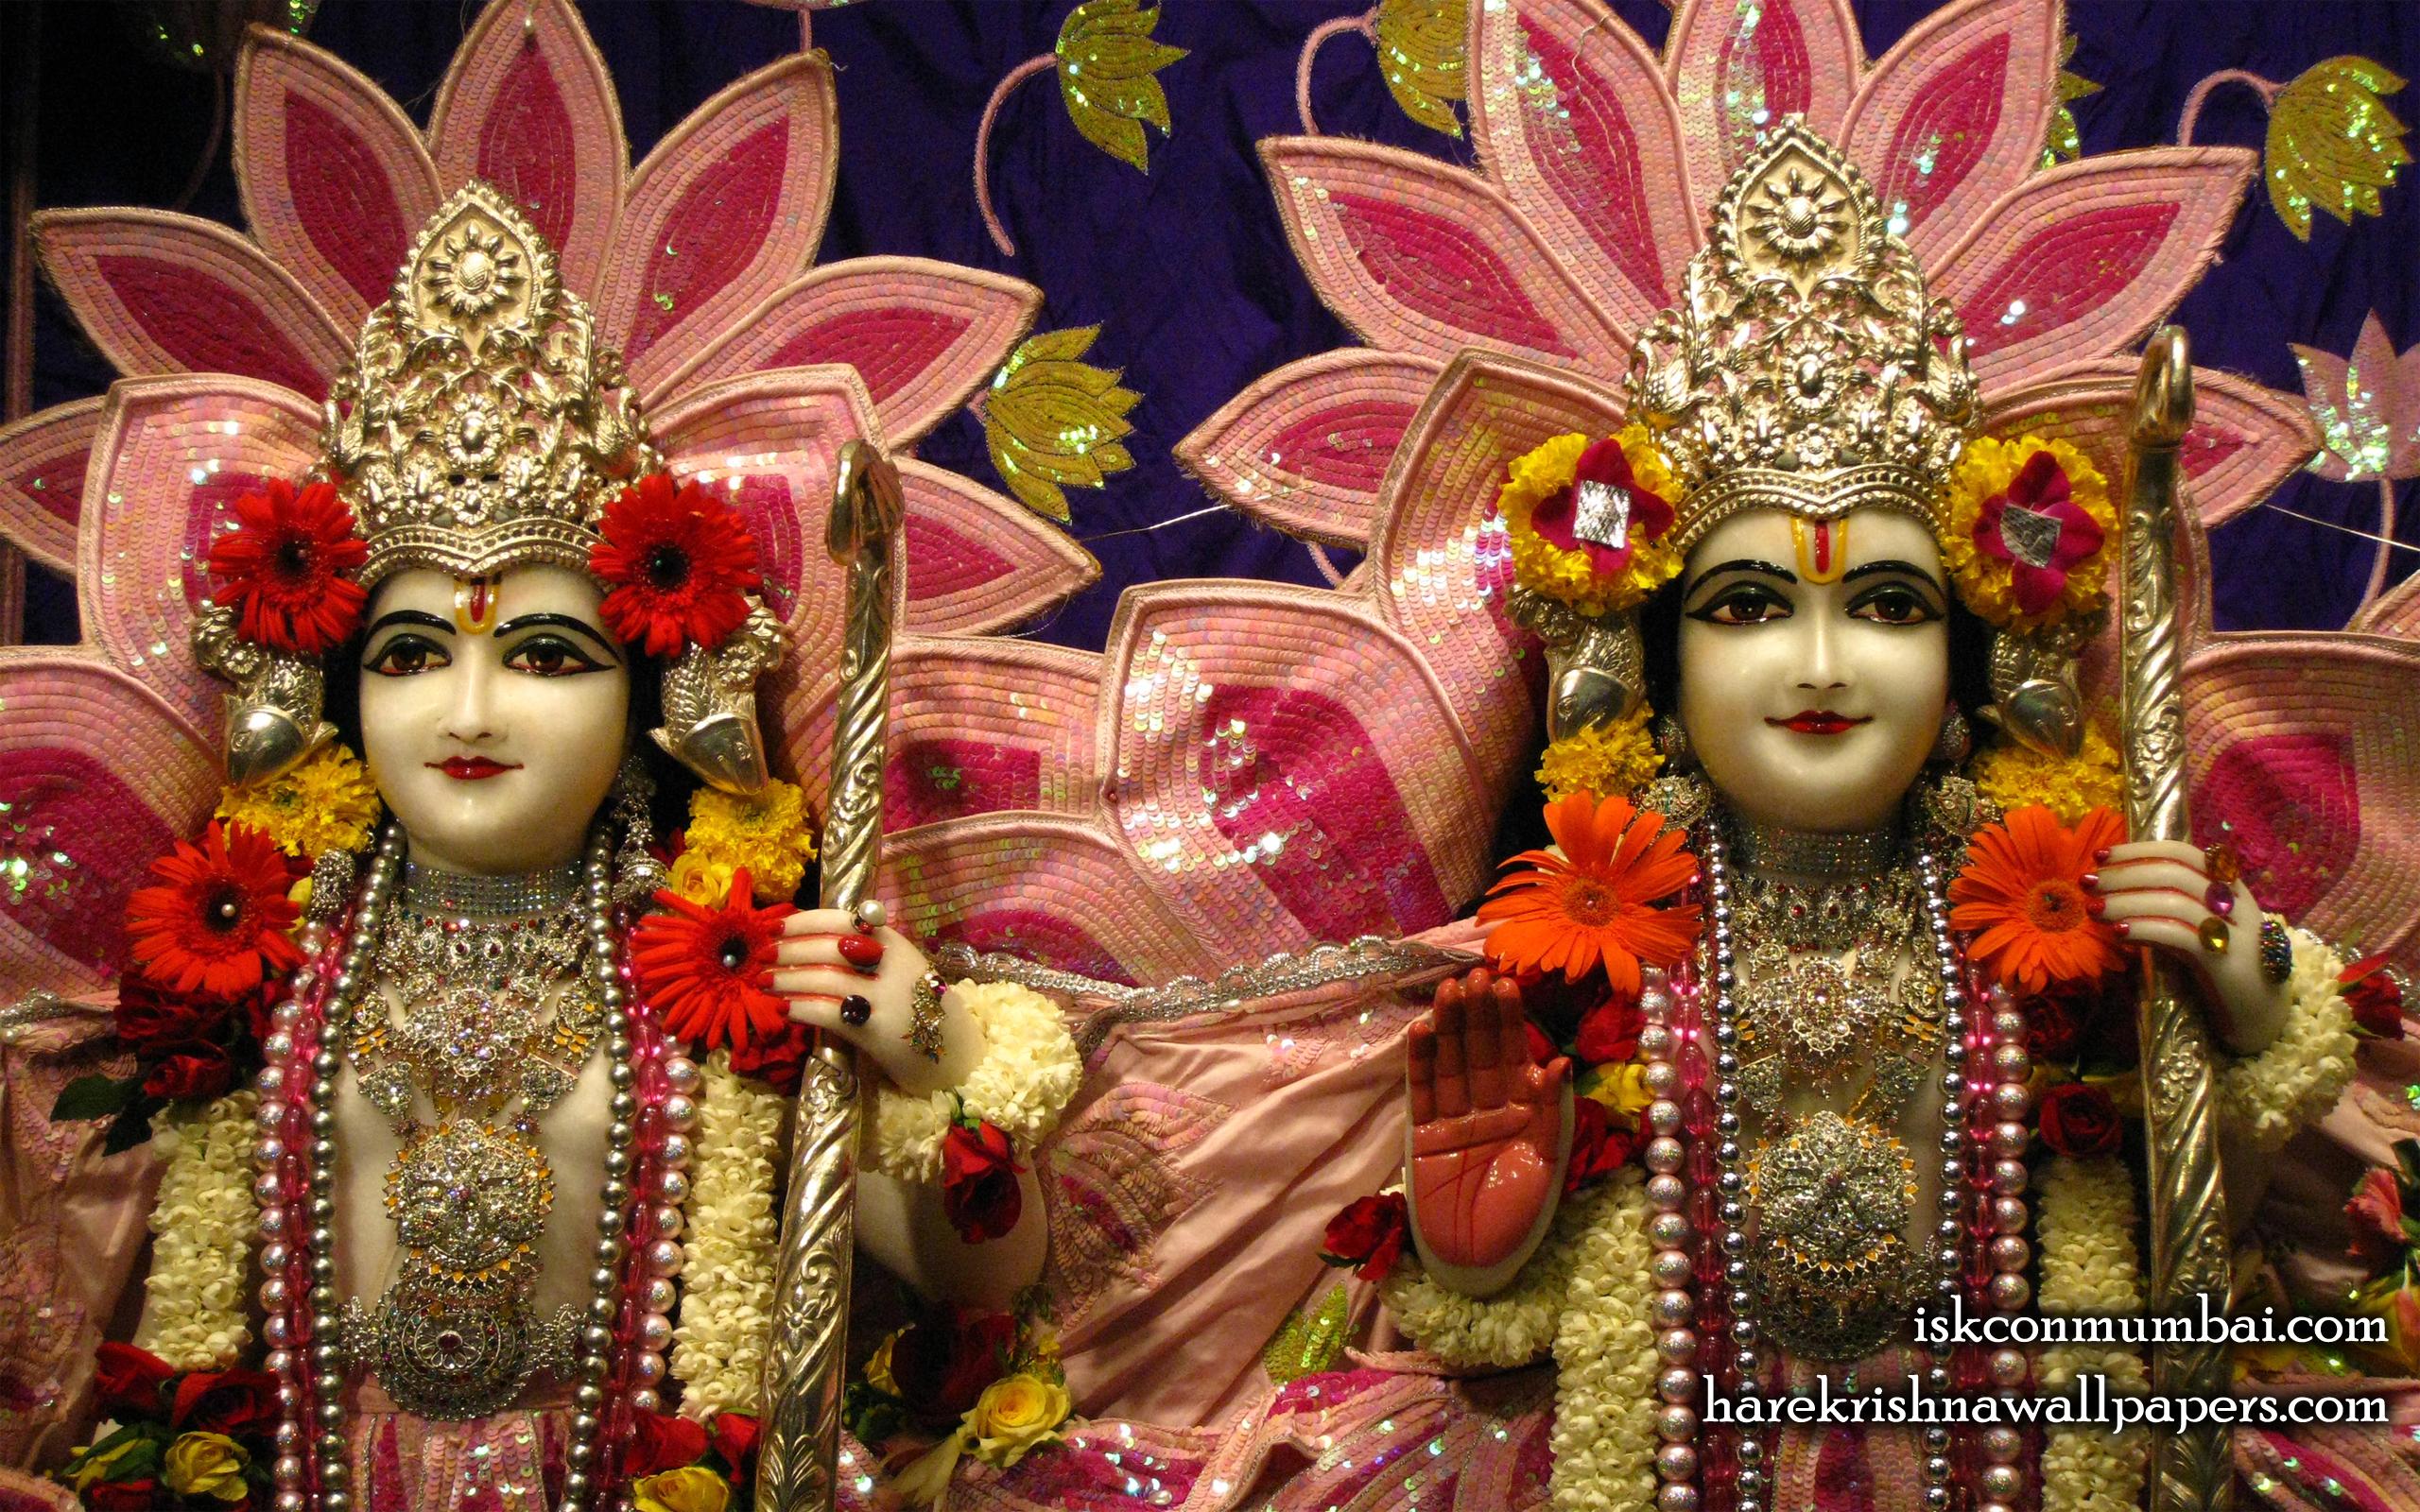 Sri Sri Rama Laxman Close up Wallpaper (010) Size 2560x1600 Download